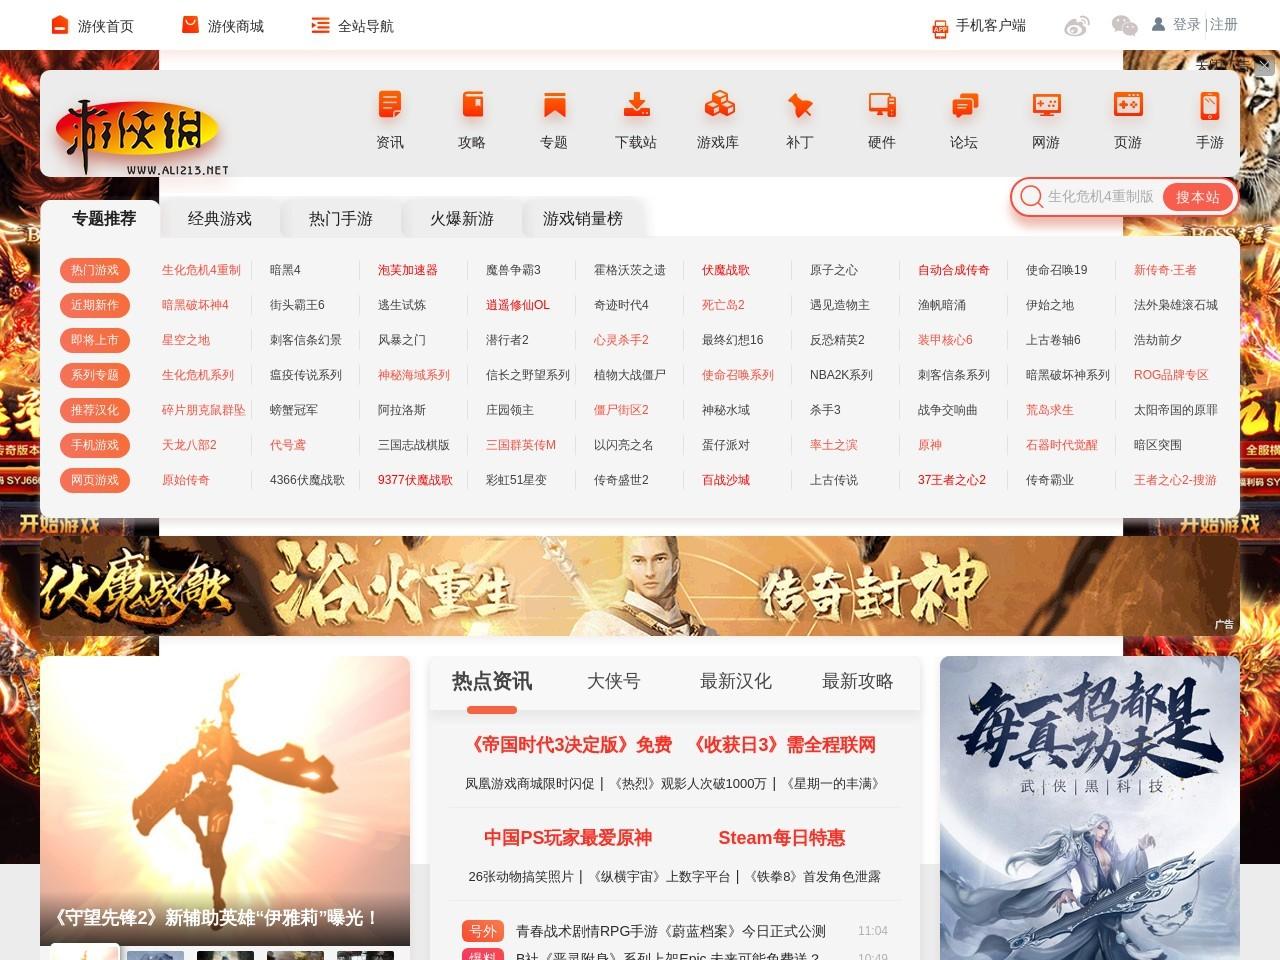 Windows 10新版UI截图曝光_游侠网 Ali213.net